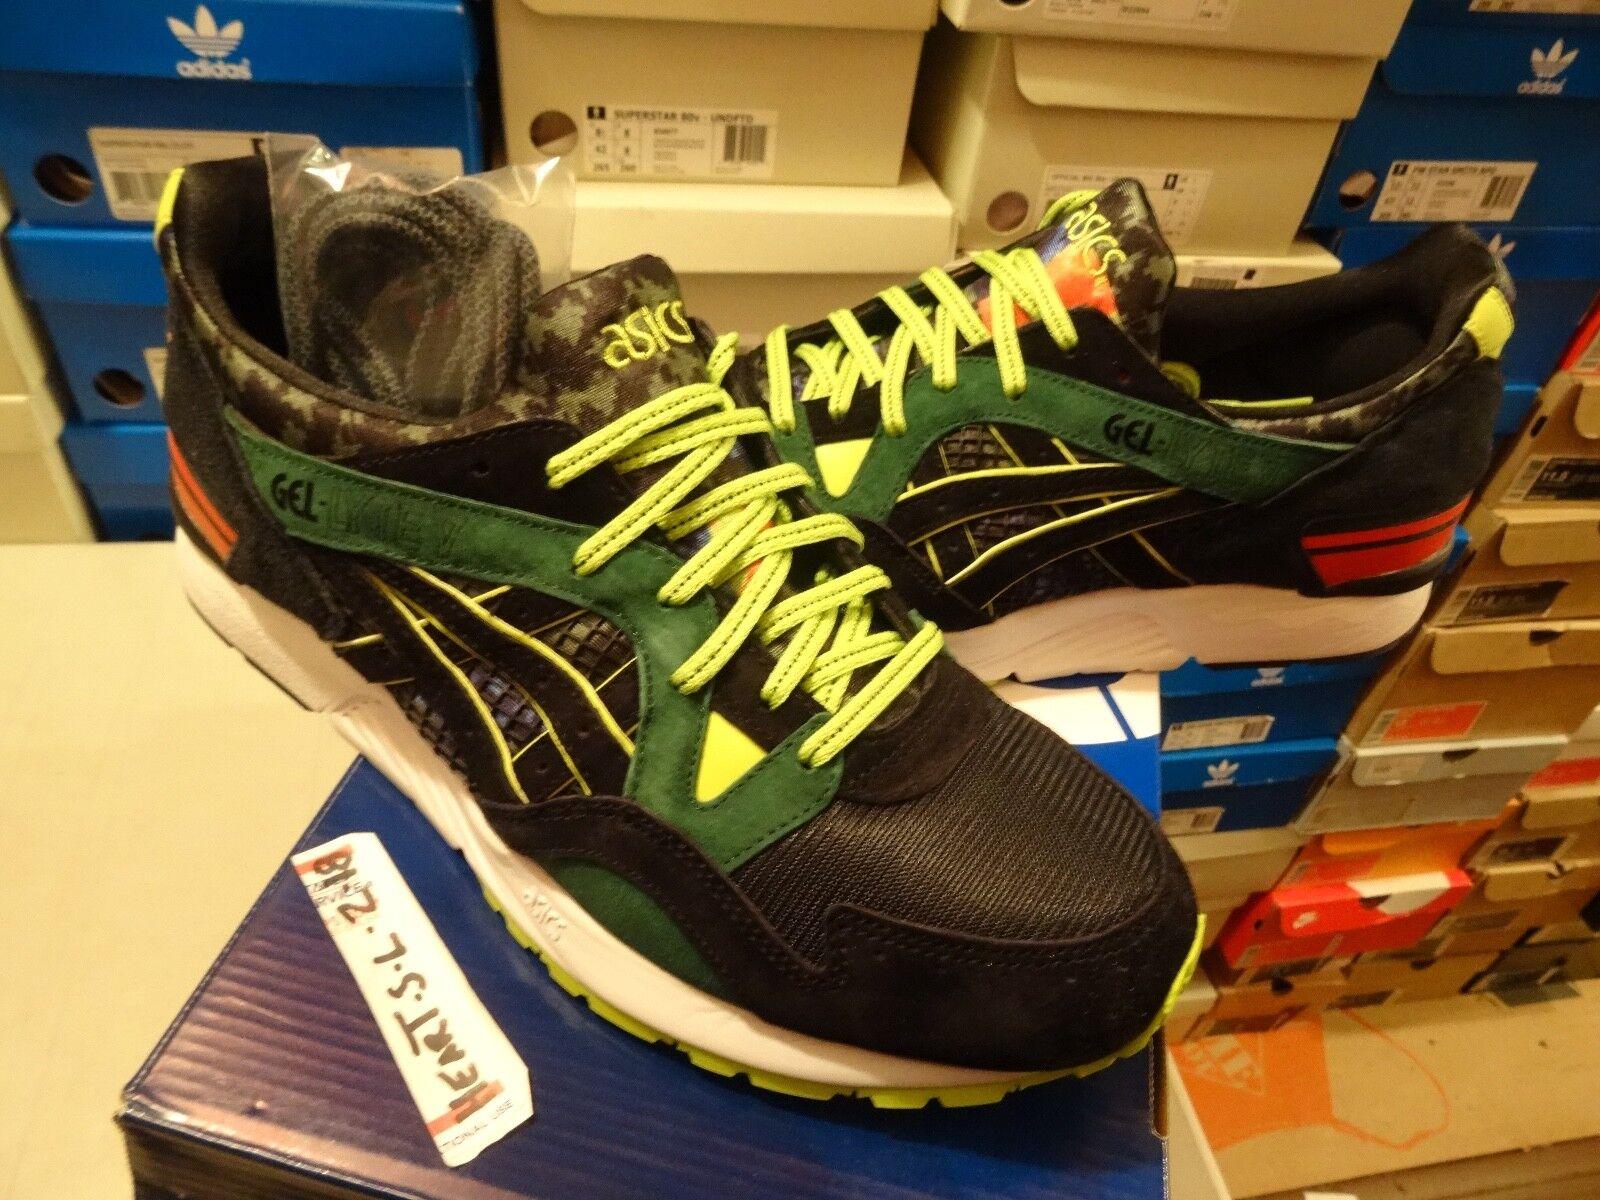 NEW Asics Gel-Lyte V x Whiz LImited x Mita Sneakers H50BK-8090 SZ 13 Ronnie Fieg